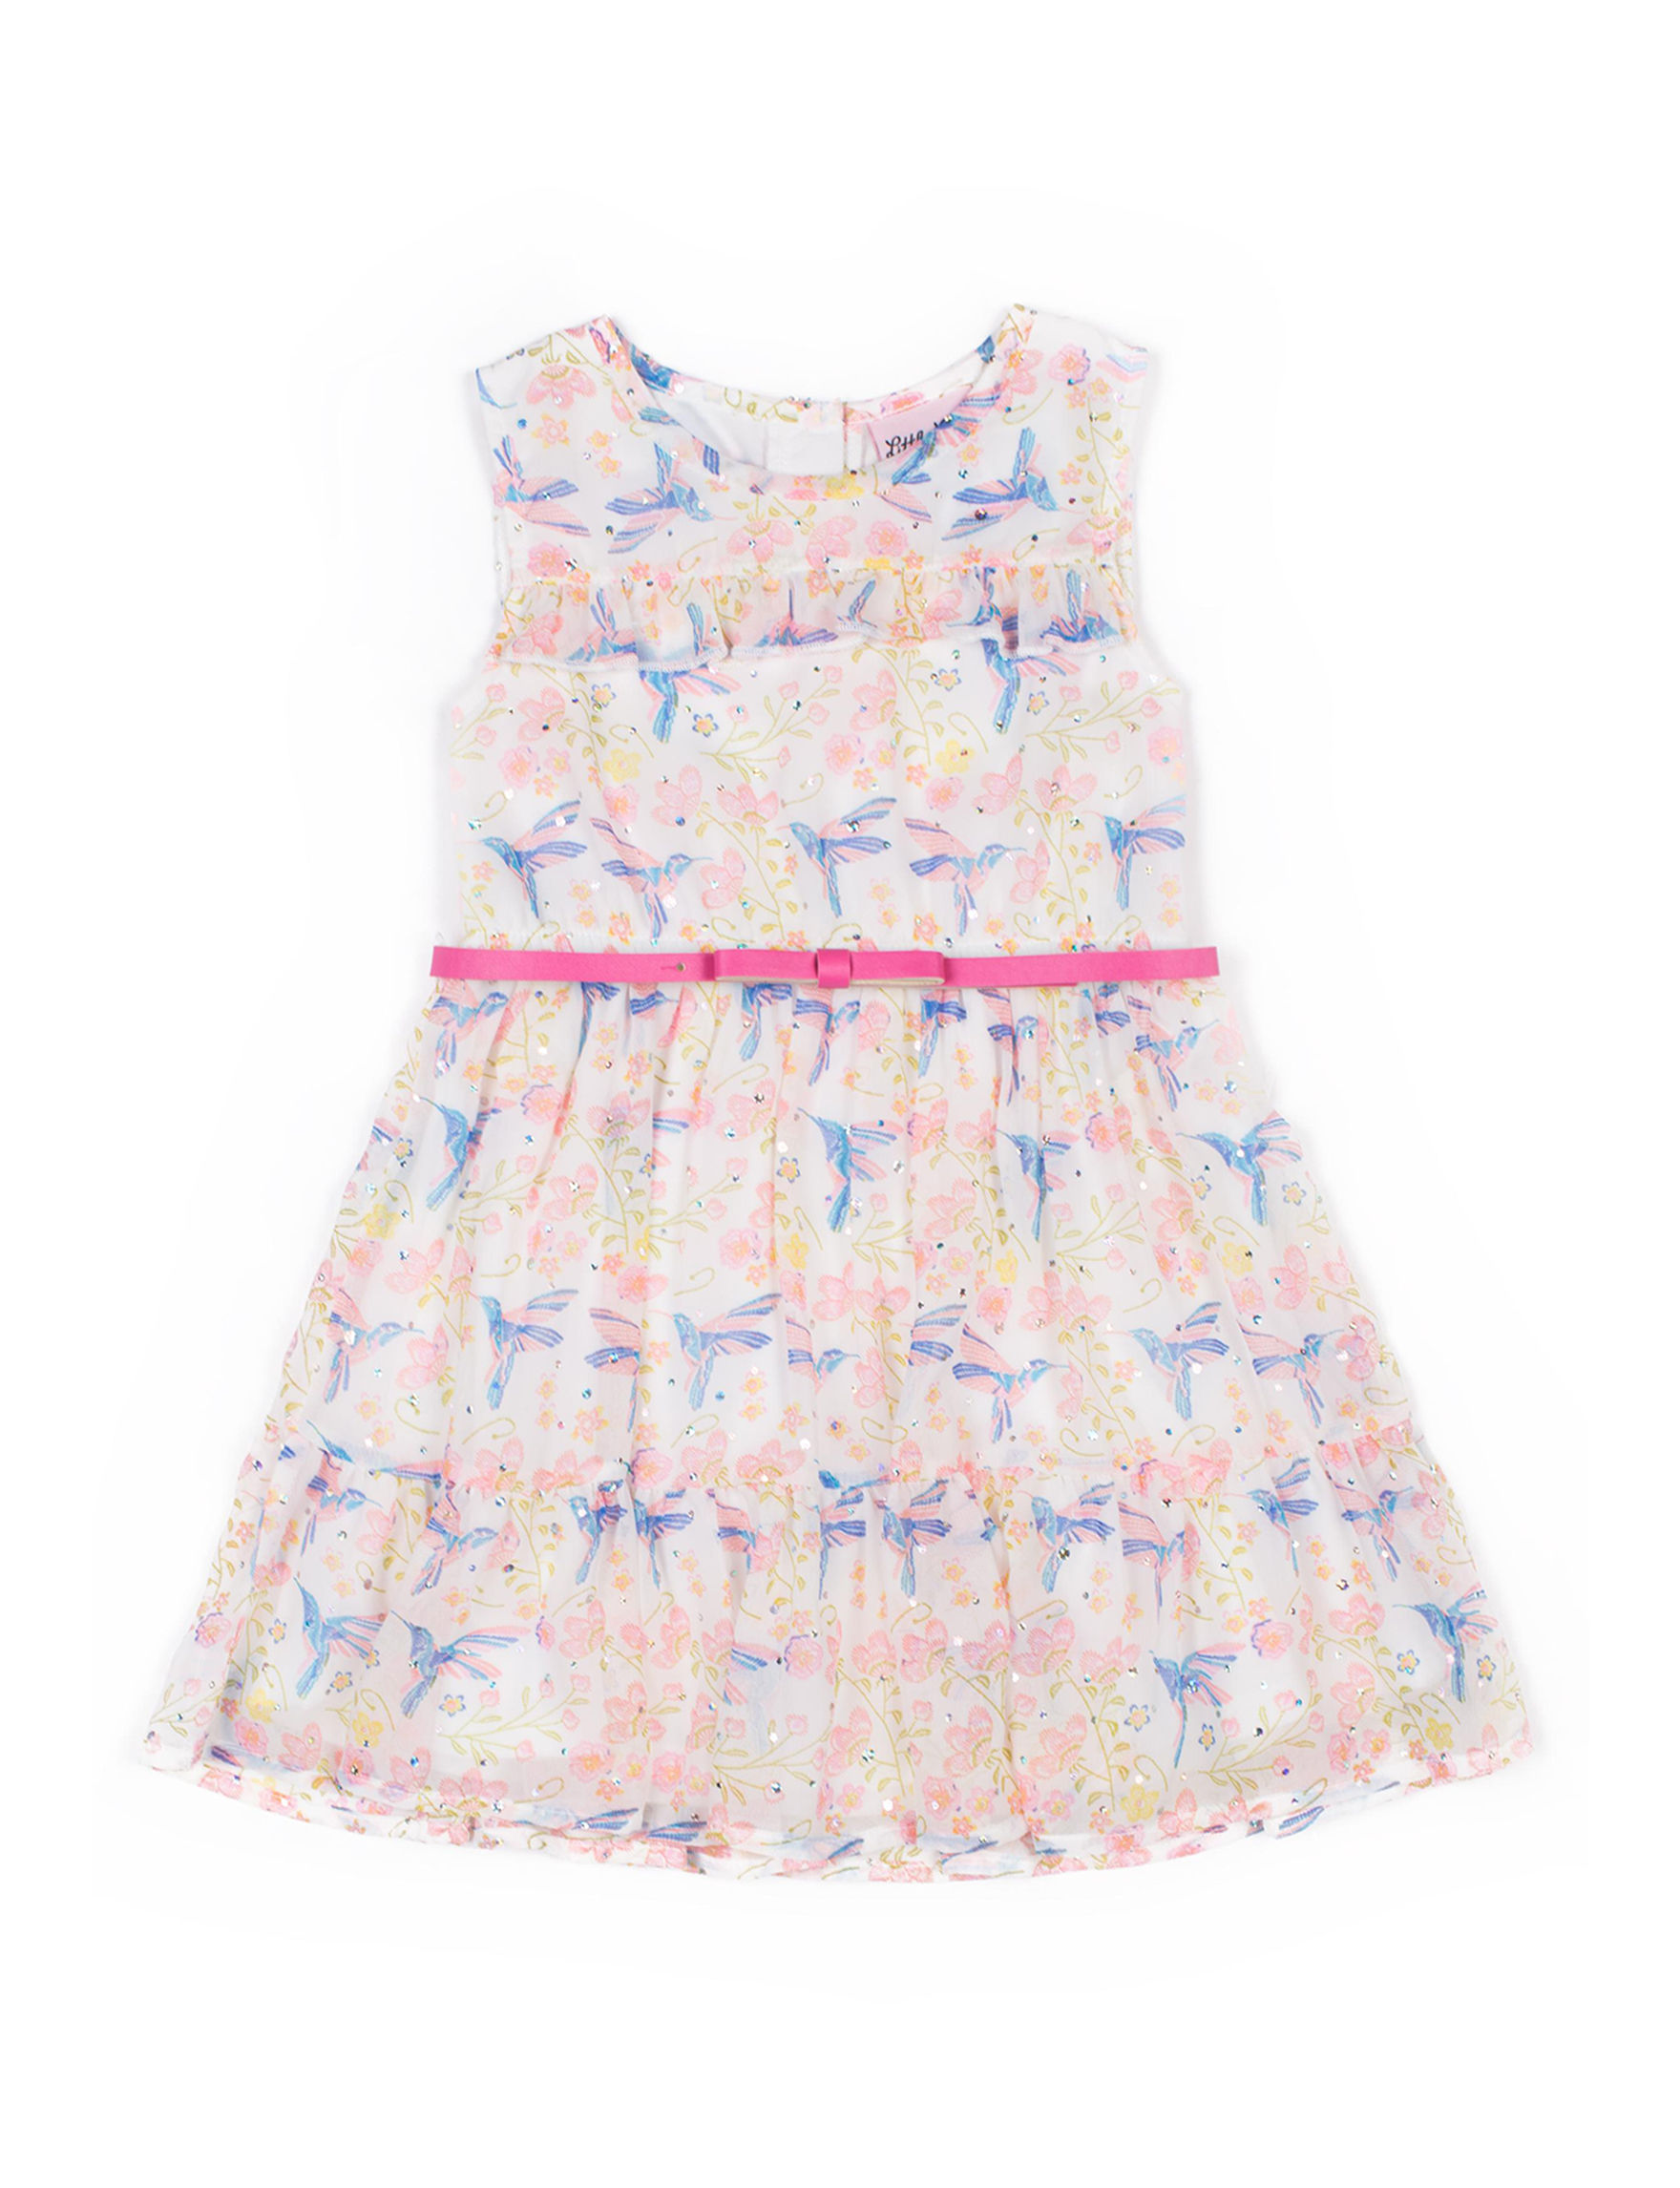 Little Lass White / Pink Multi